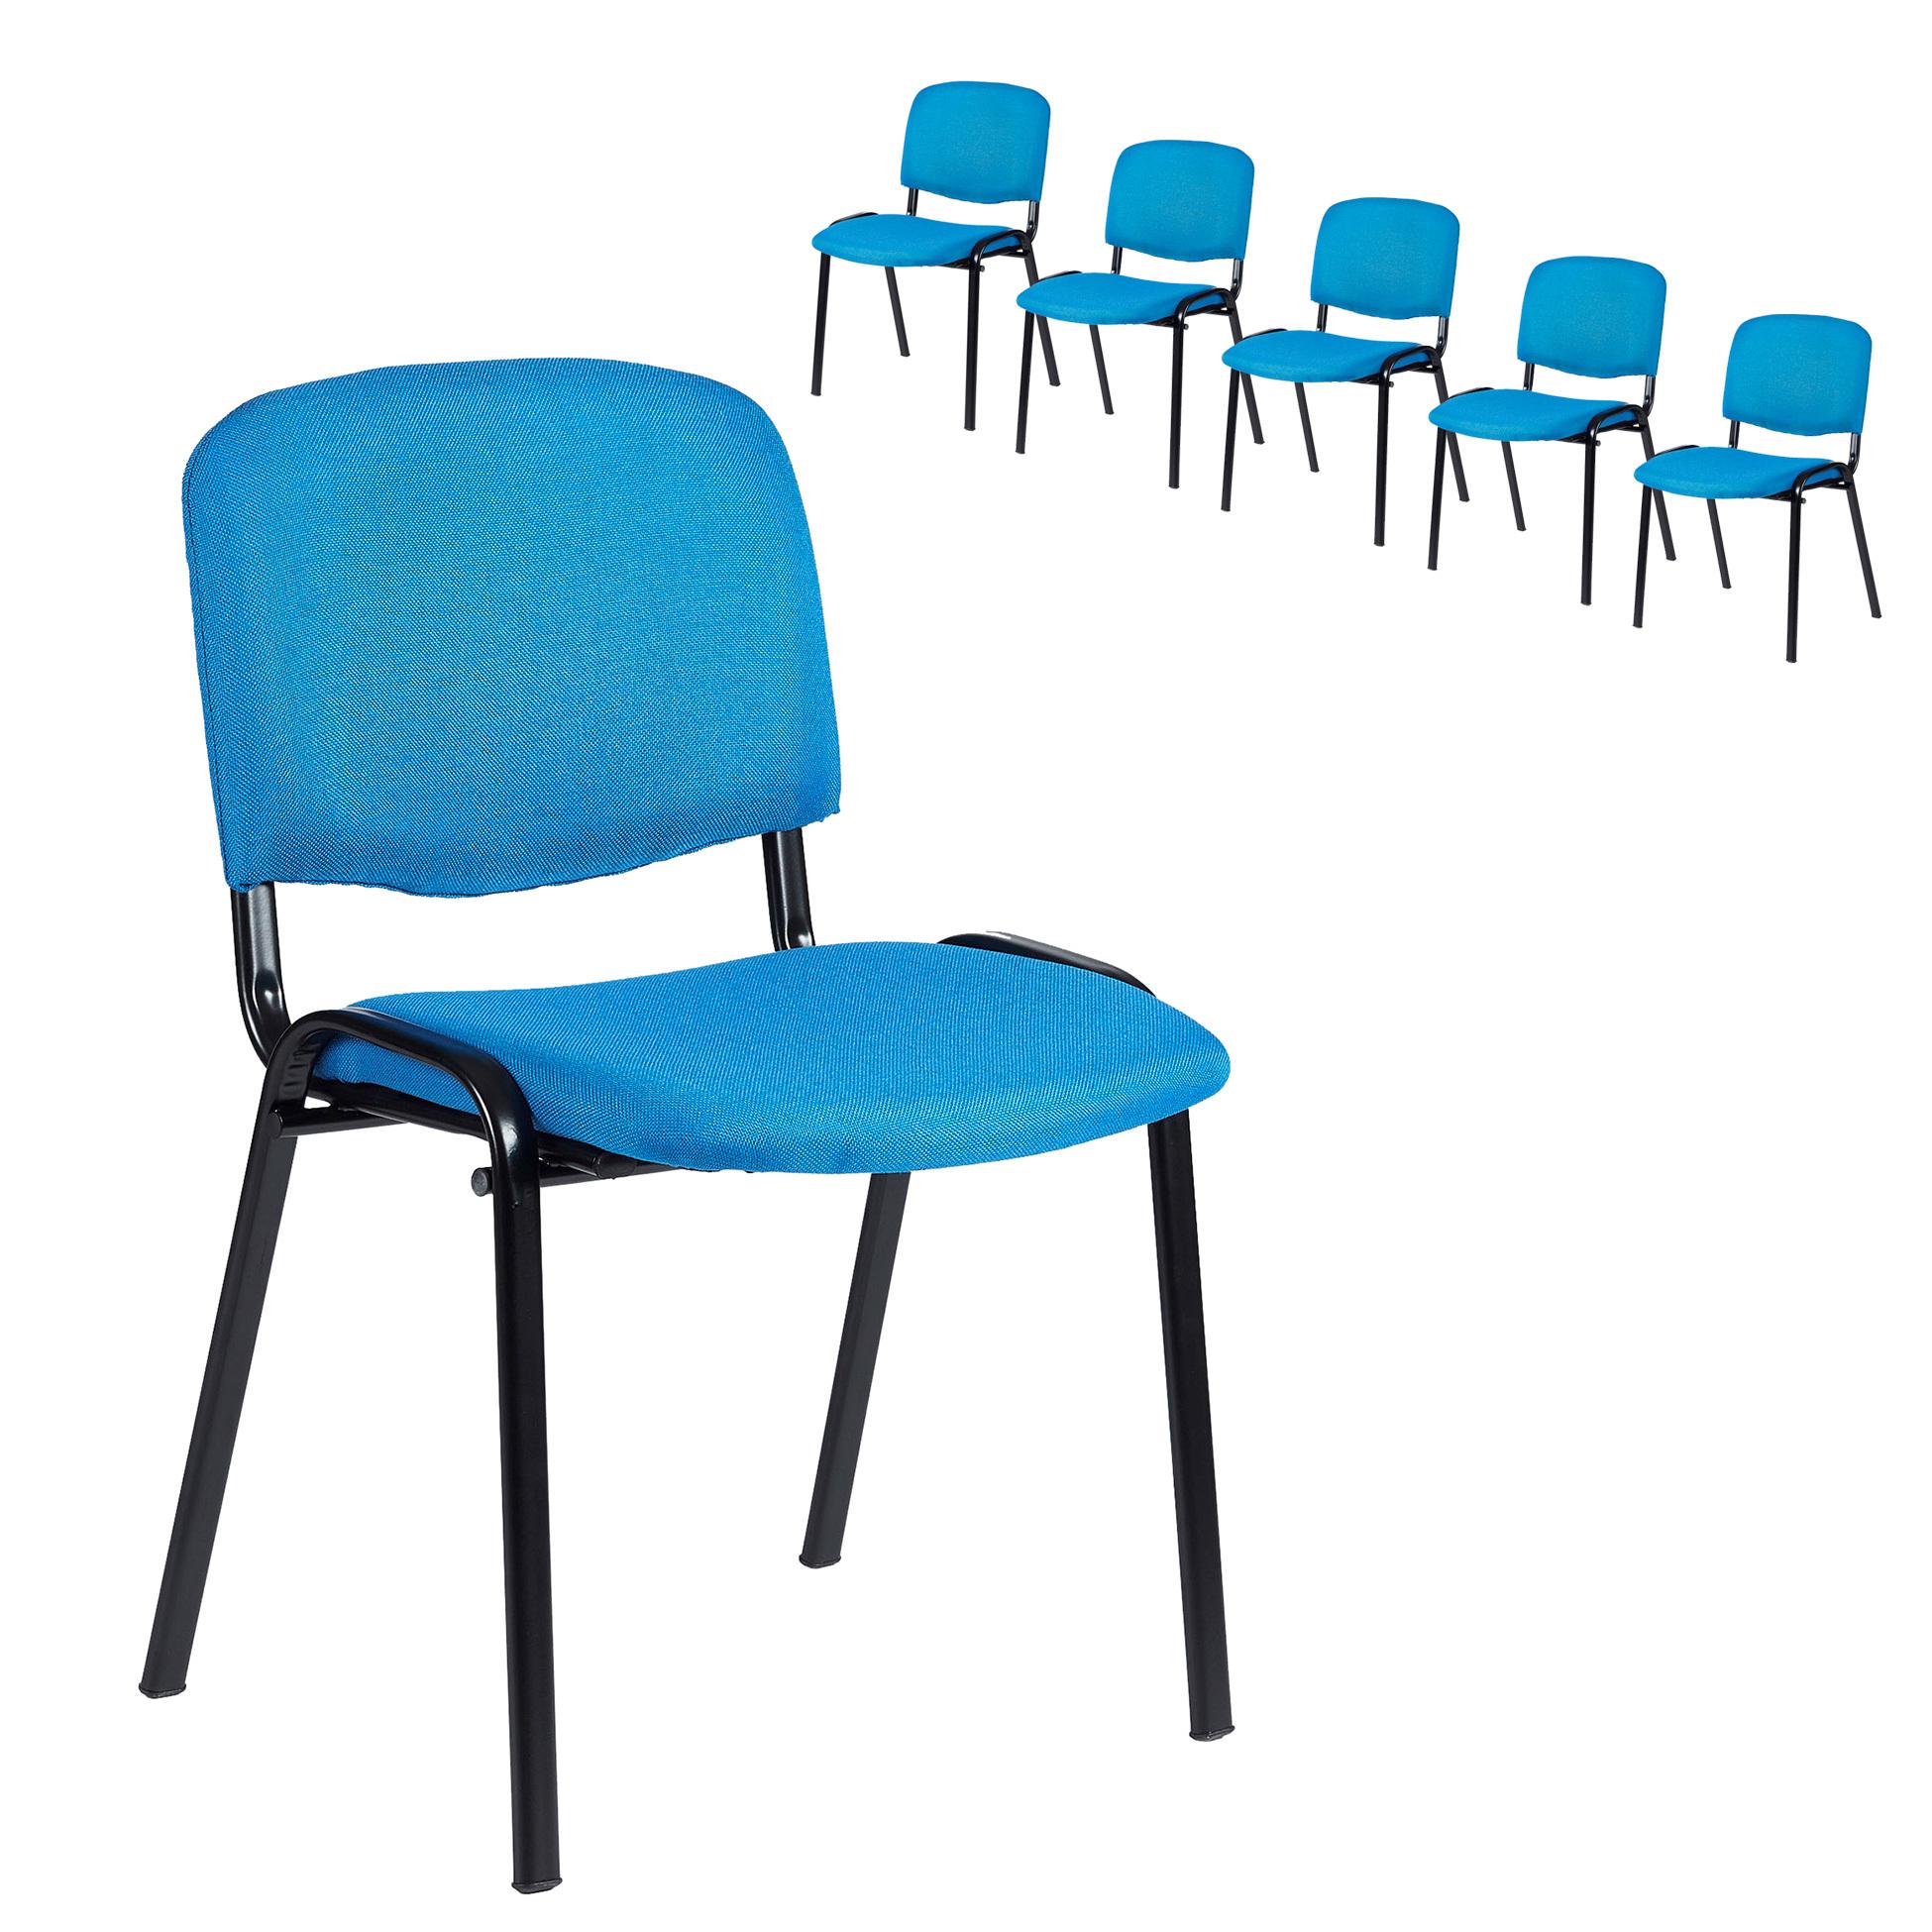 fice Chairs